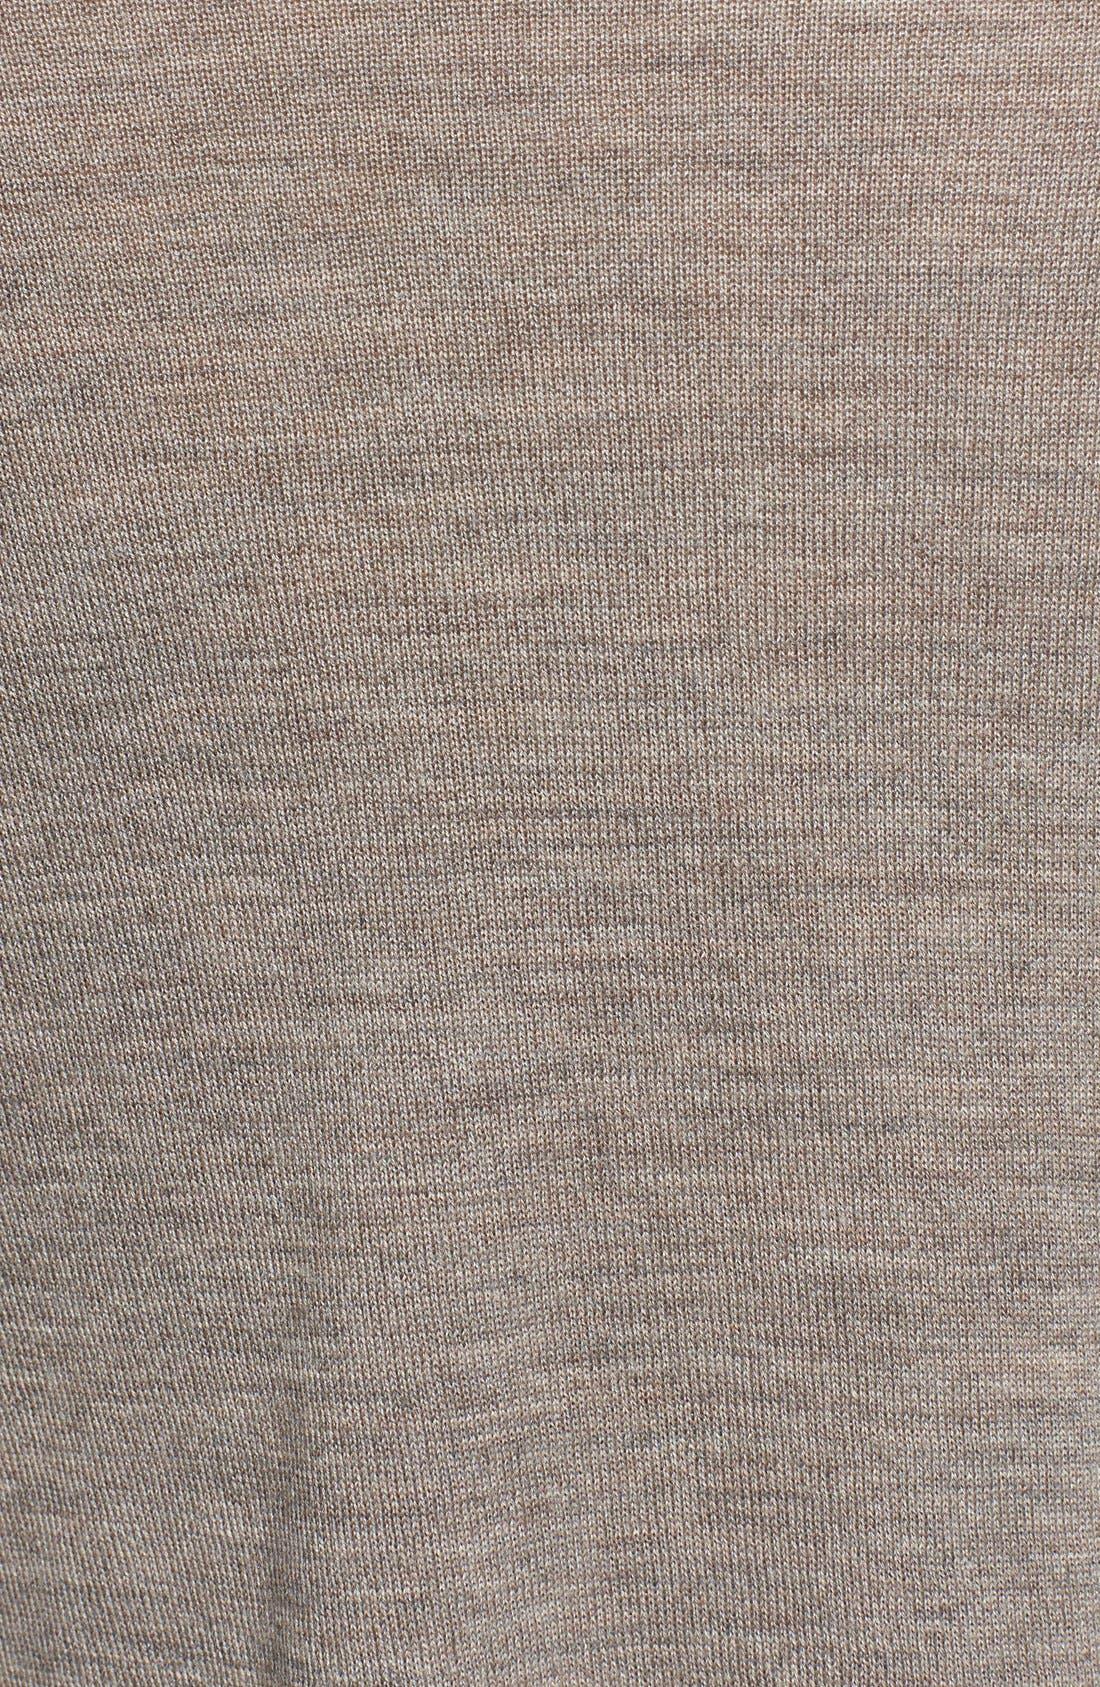 Alternate Image 3  - Theory 'Landran' Wool & Silk Sweater